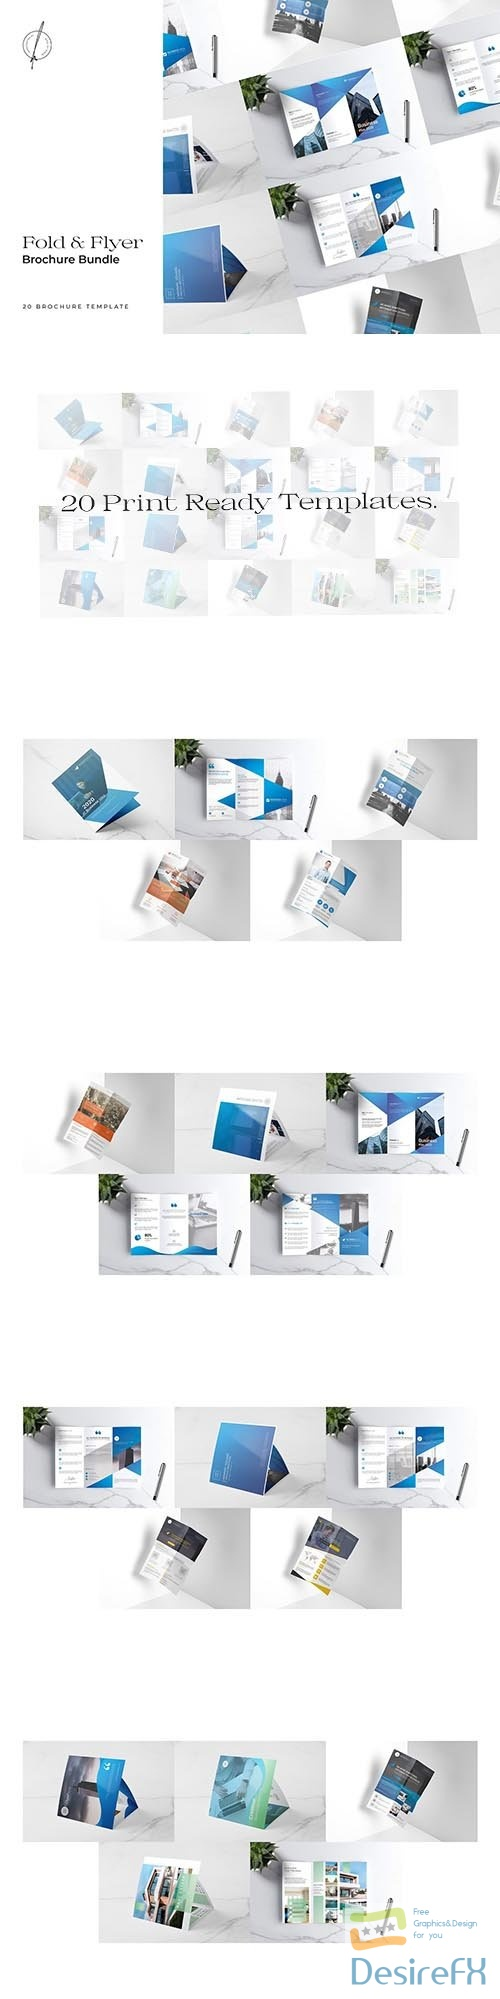 CreativeMarket - Fold & Flyer Brochure Bundle 5480573